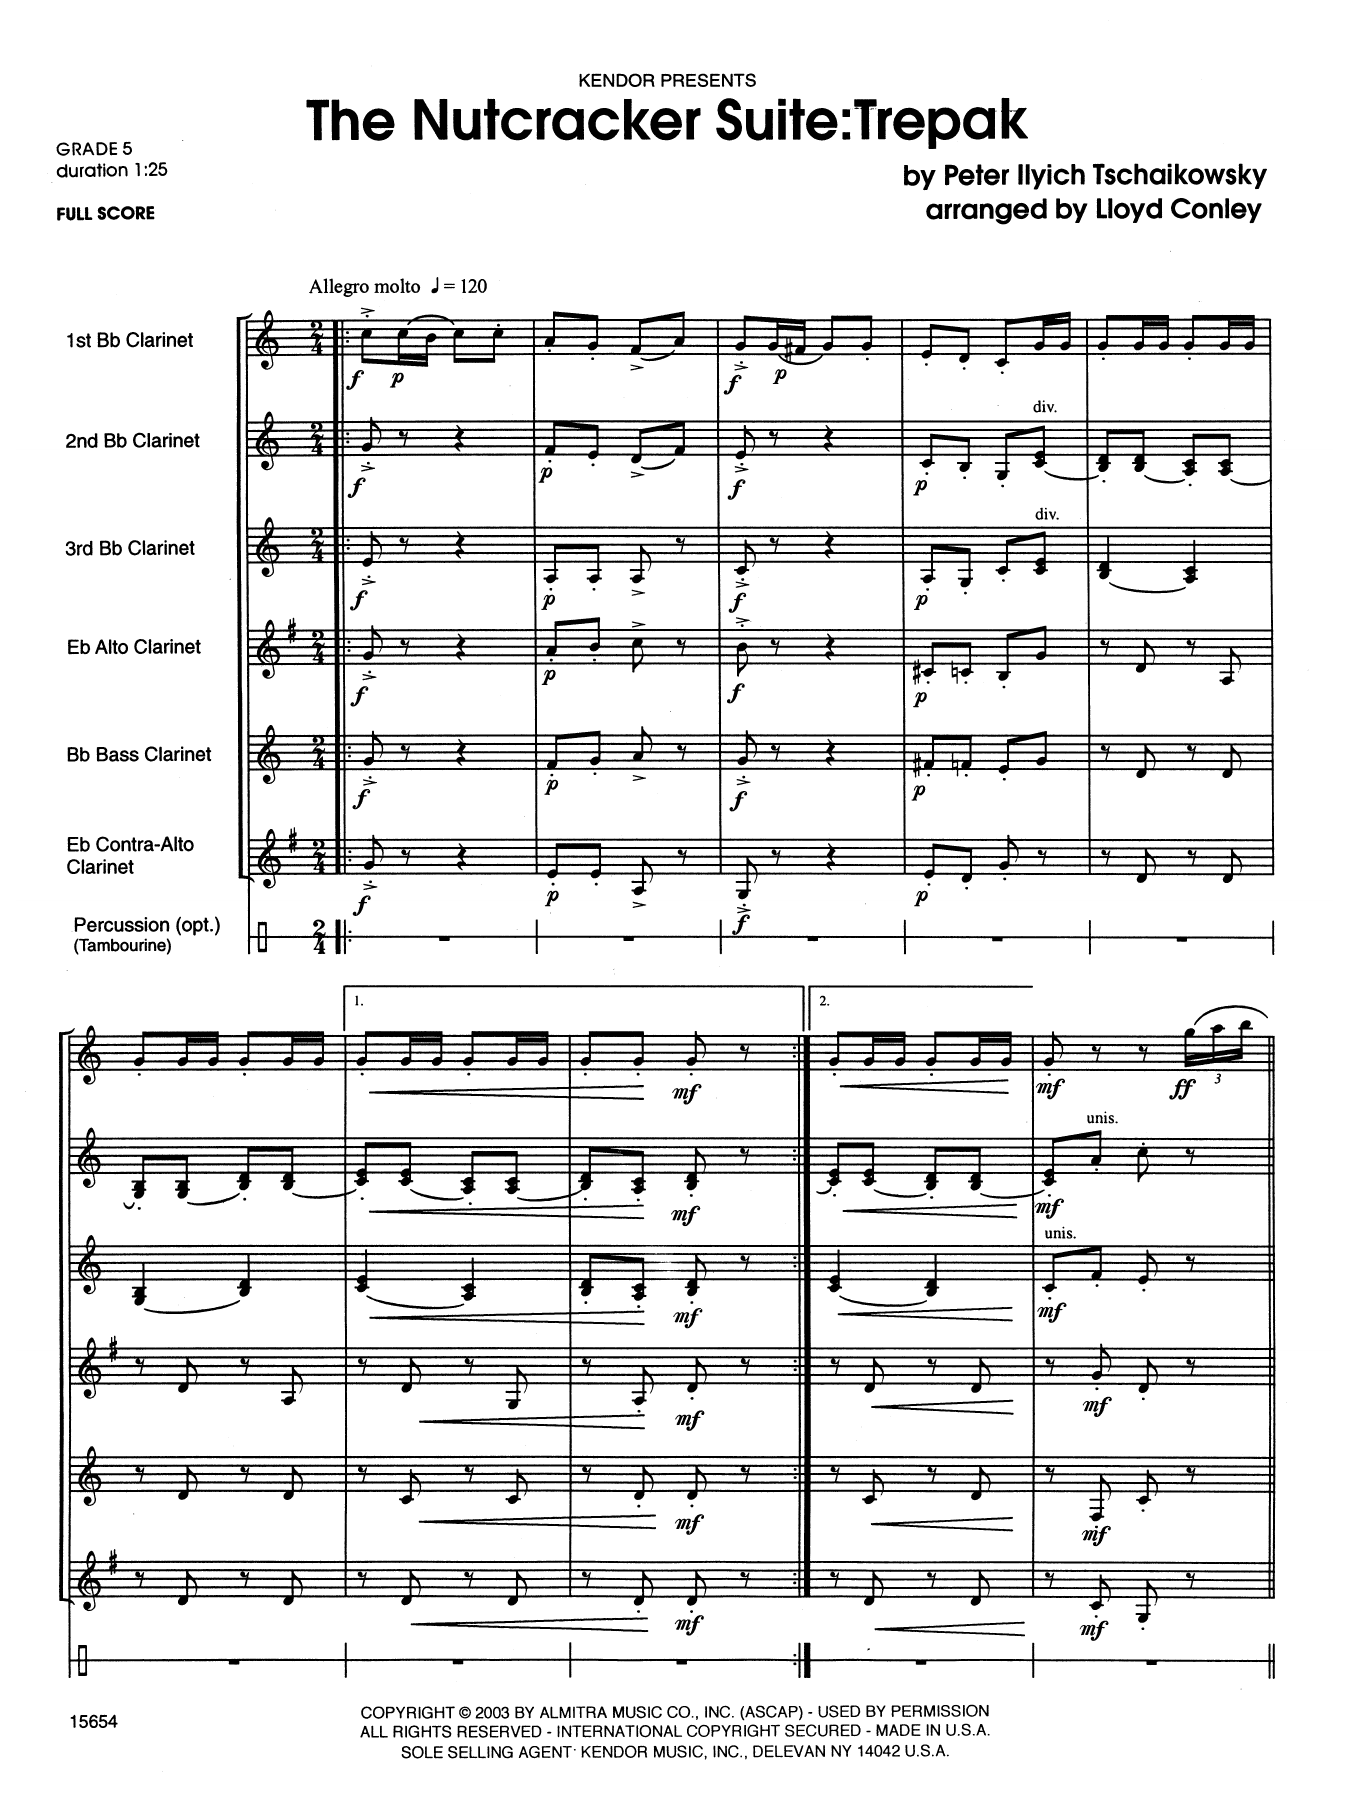 Lloyd Conley The Nutcracker Suite: Trepak - Full Score sheet music notes printable PDF score